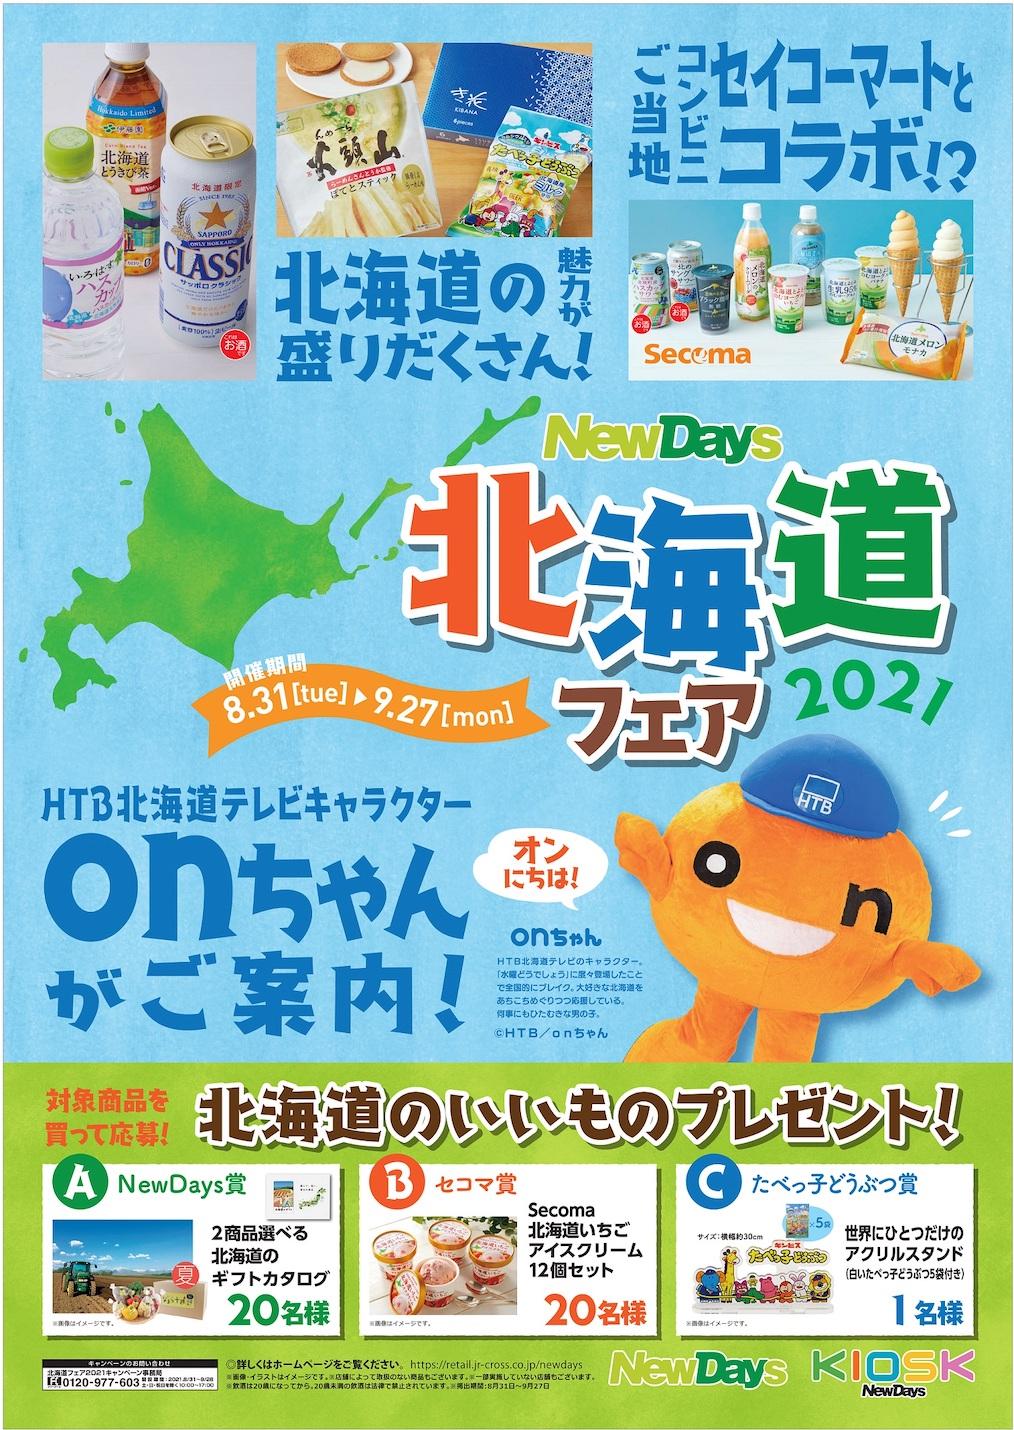 NewDays 北海道フェア2021